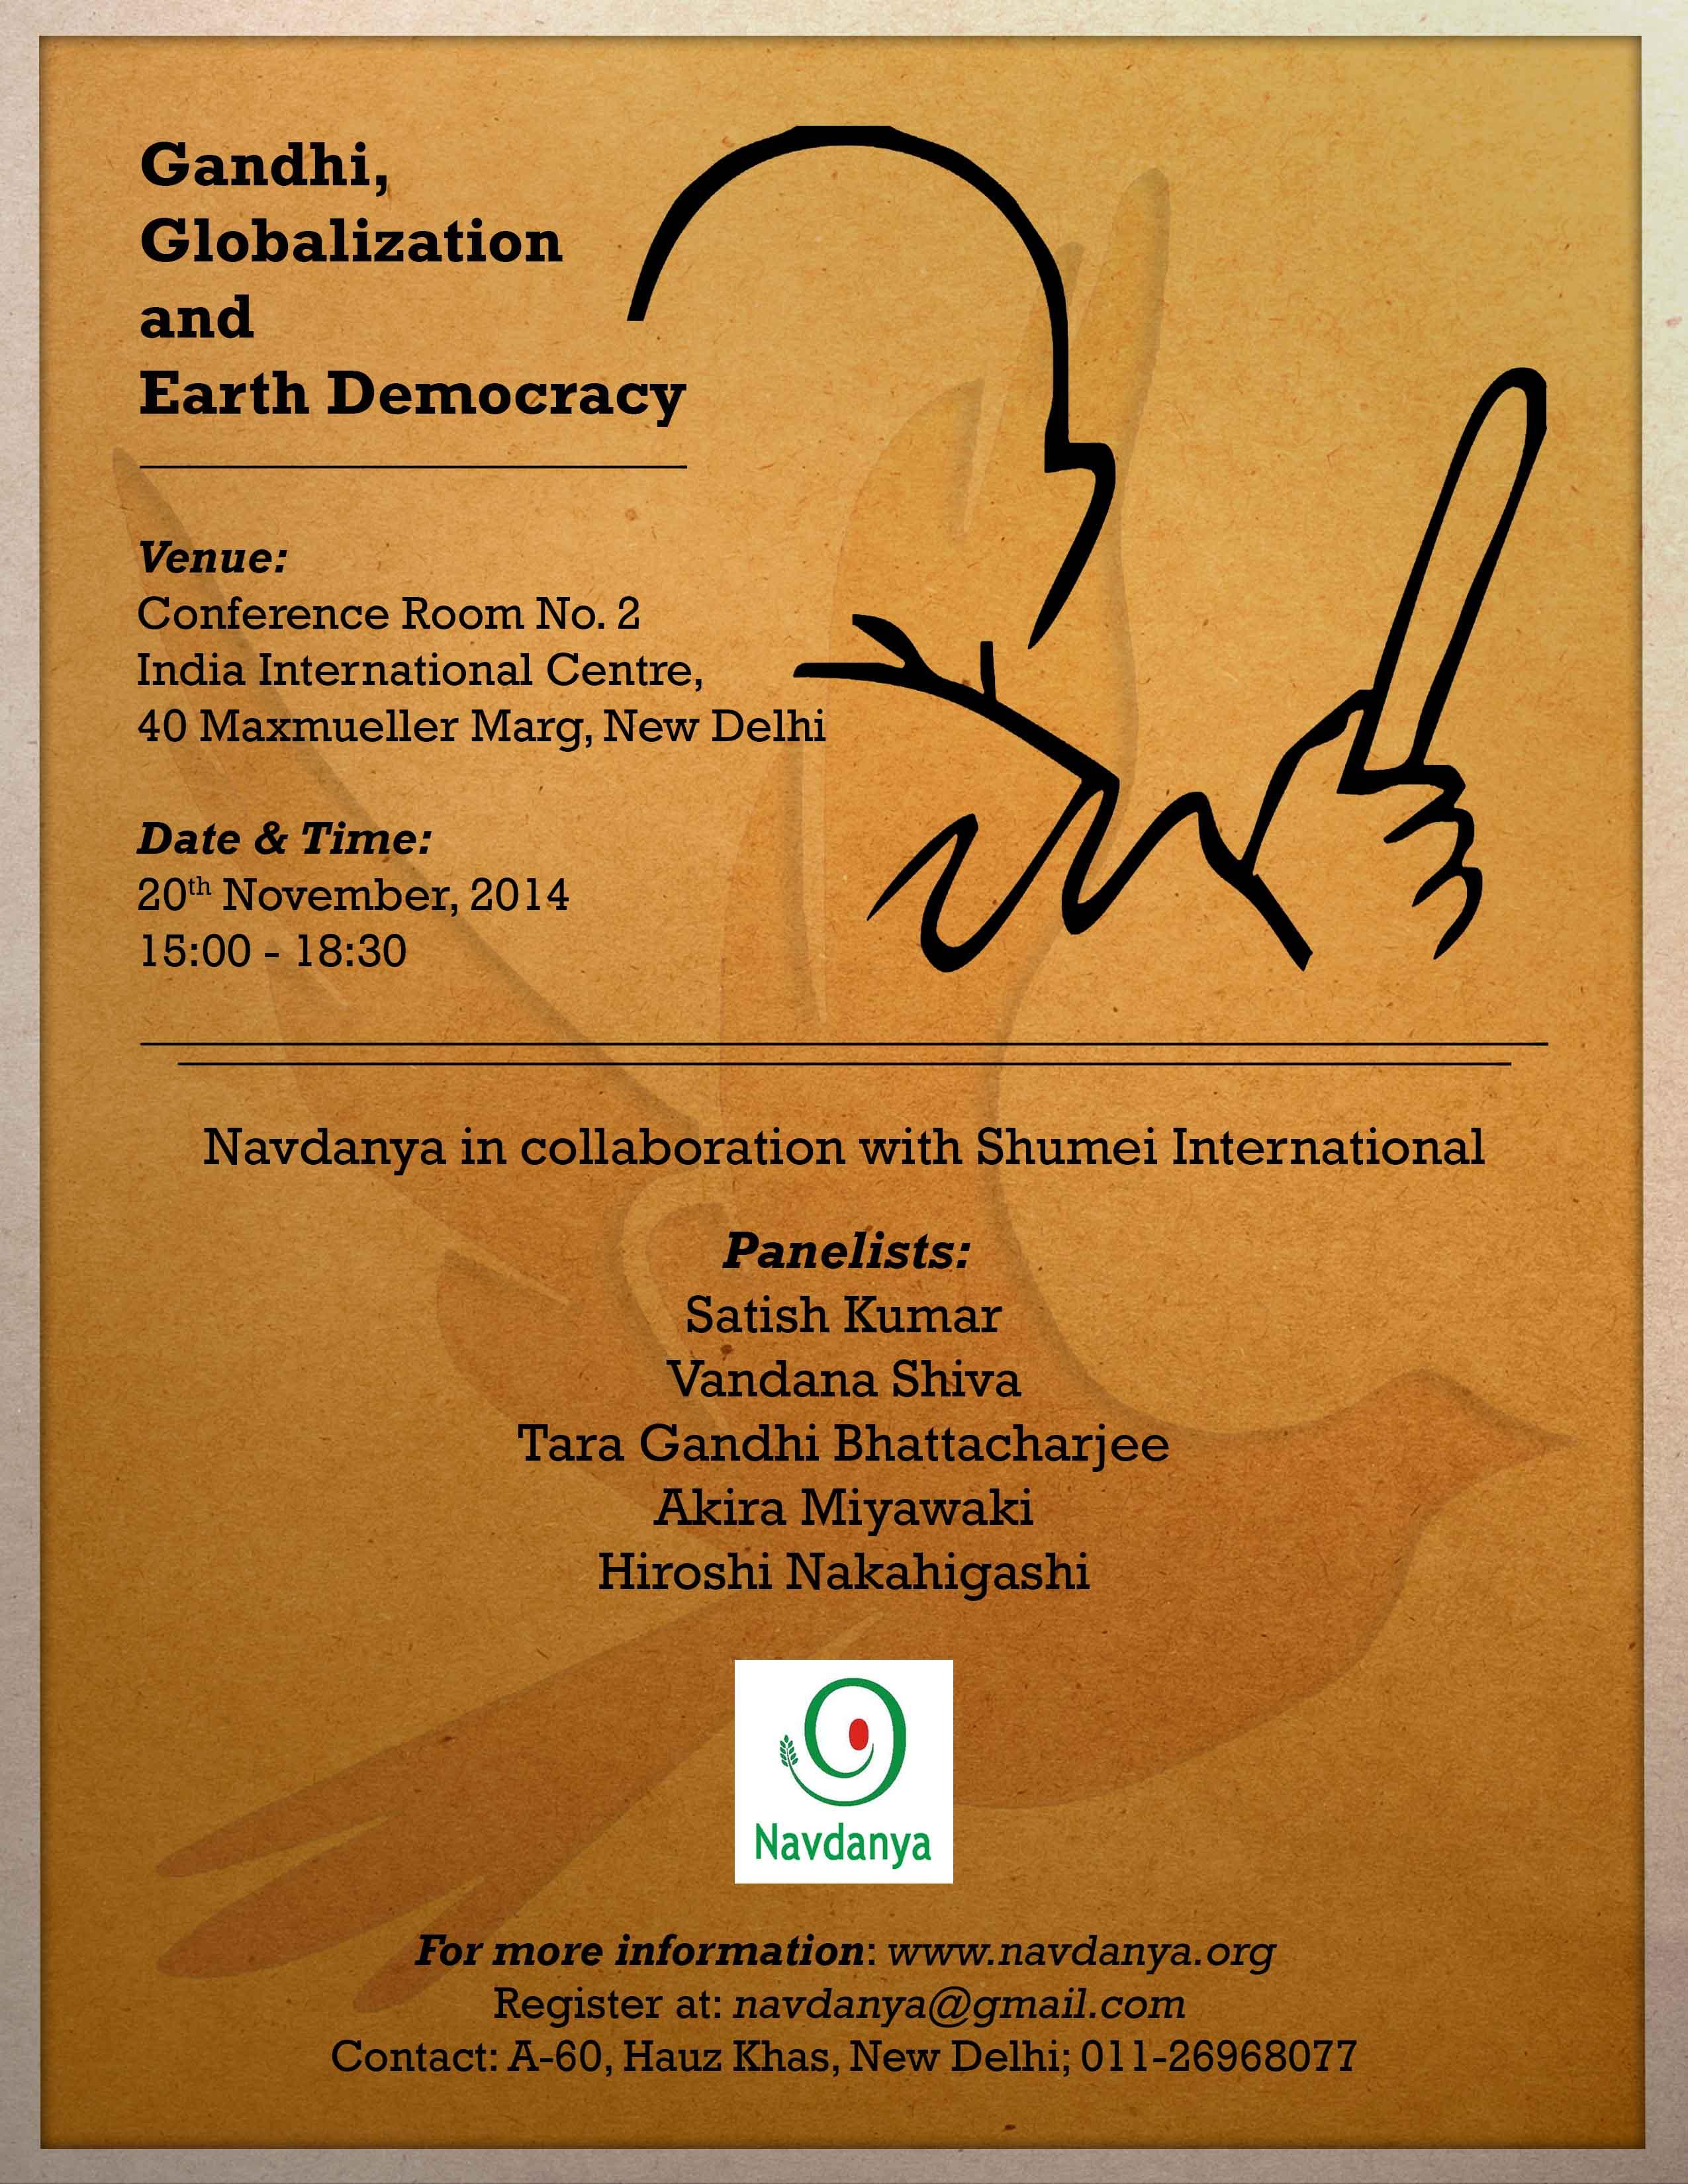 Gandhi, Globalization & Earth Democracy